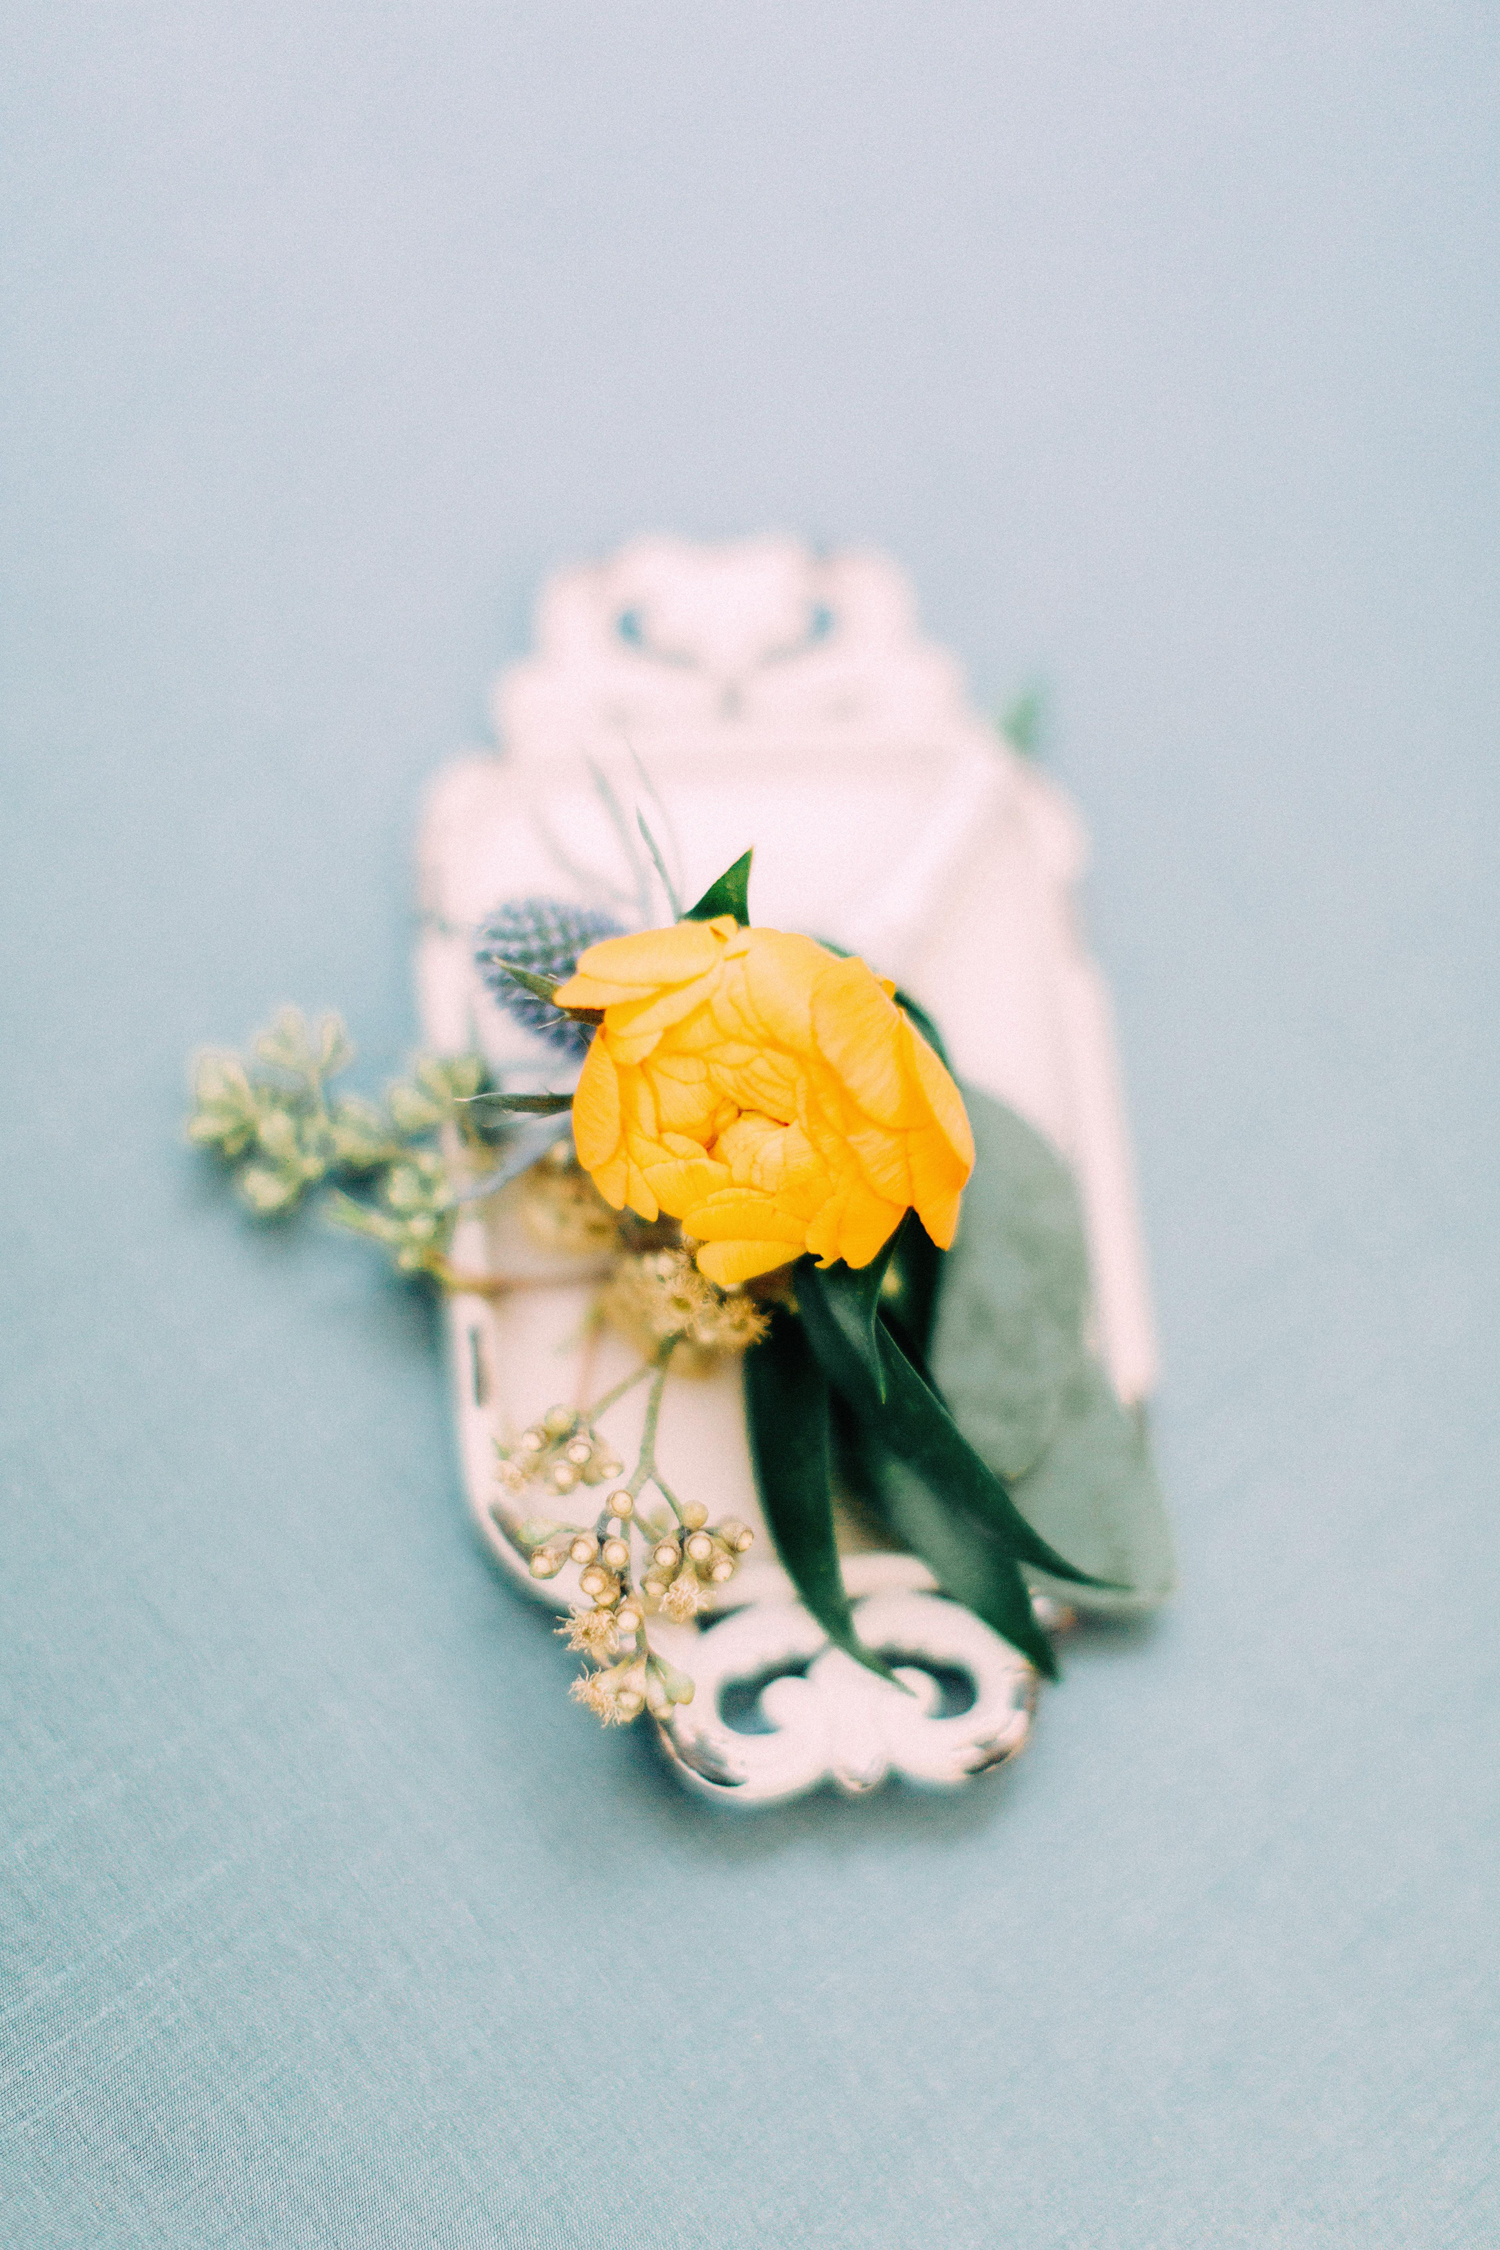 010-alaamarzouk-alaamarzoukphotography-mcallenweddingphotographer-alaa-marzouk-mcallen-mission-wedding-texas-venue-photography-wedding-california-bride-bridal-engagement-austin-elopement.jpg